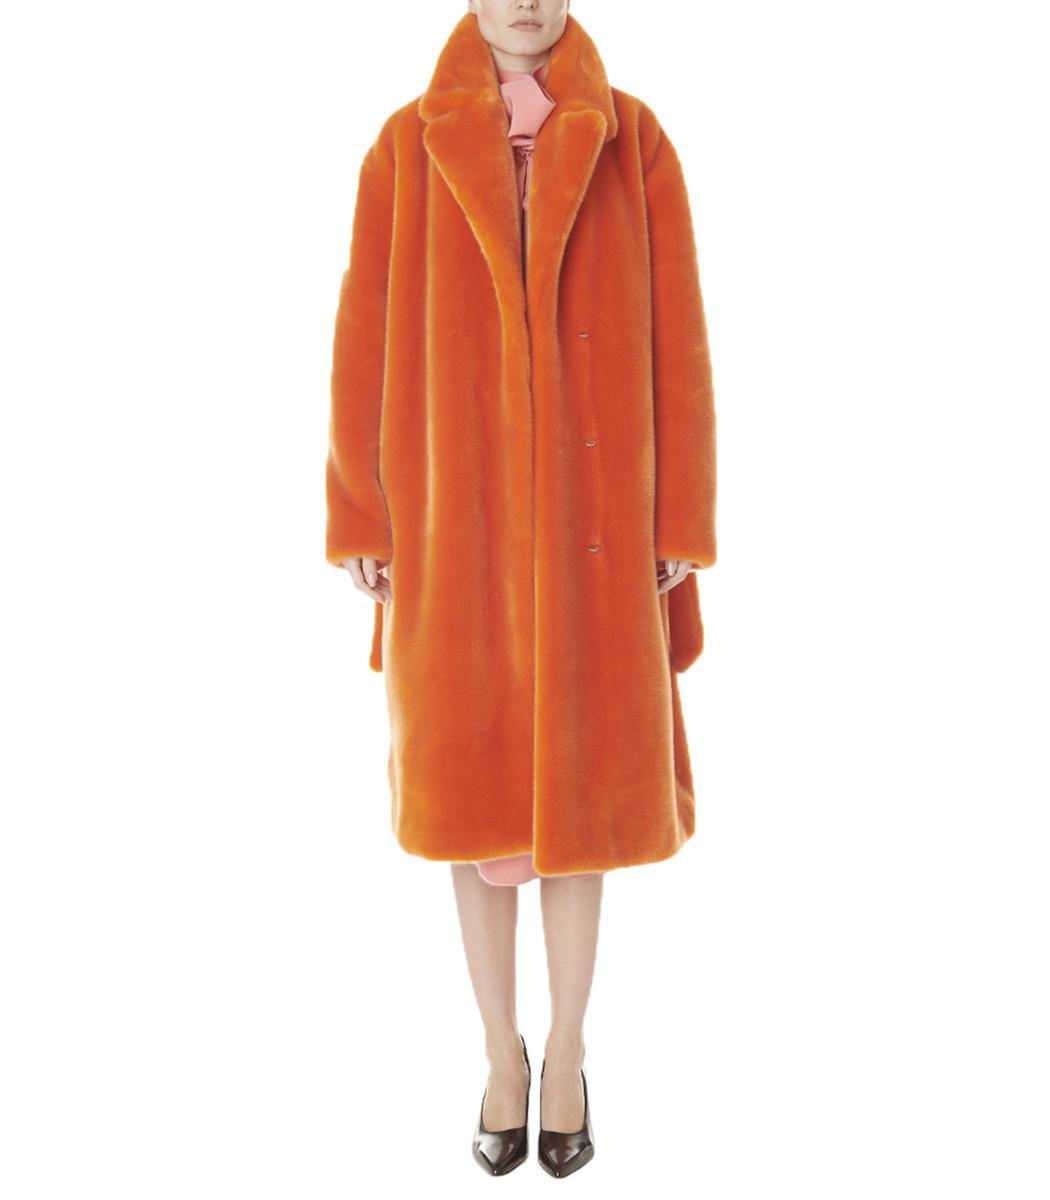 345dac38d7fd Lyst - Tibi Luxe Faux Fur Oversized Coat in Orange